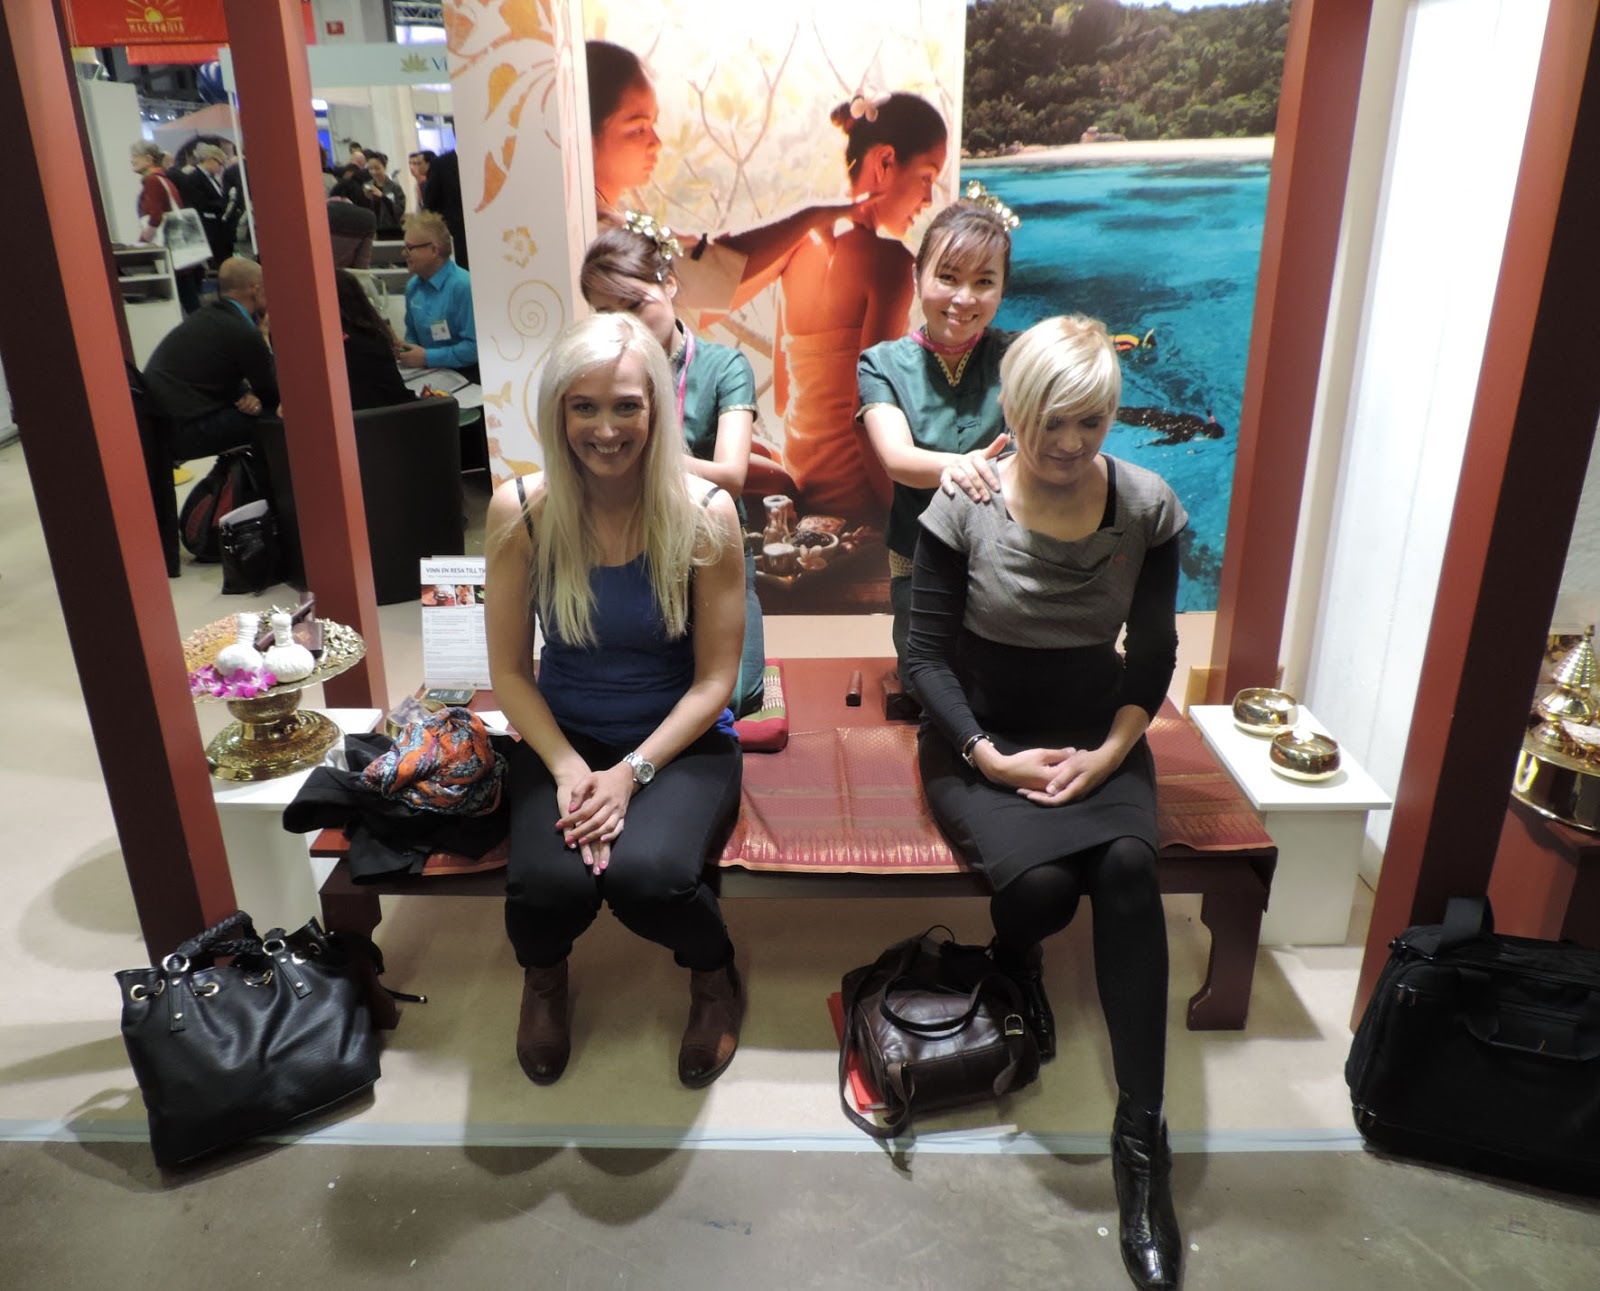 xxx porrfilm thai massage södertälje